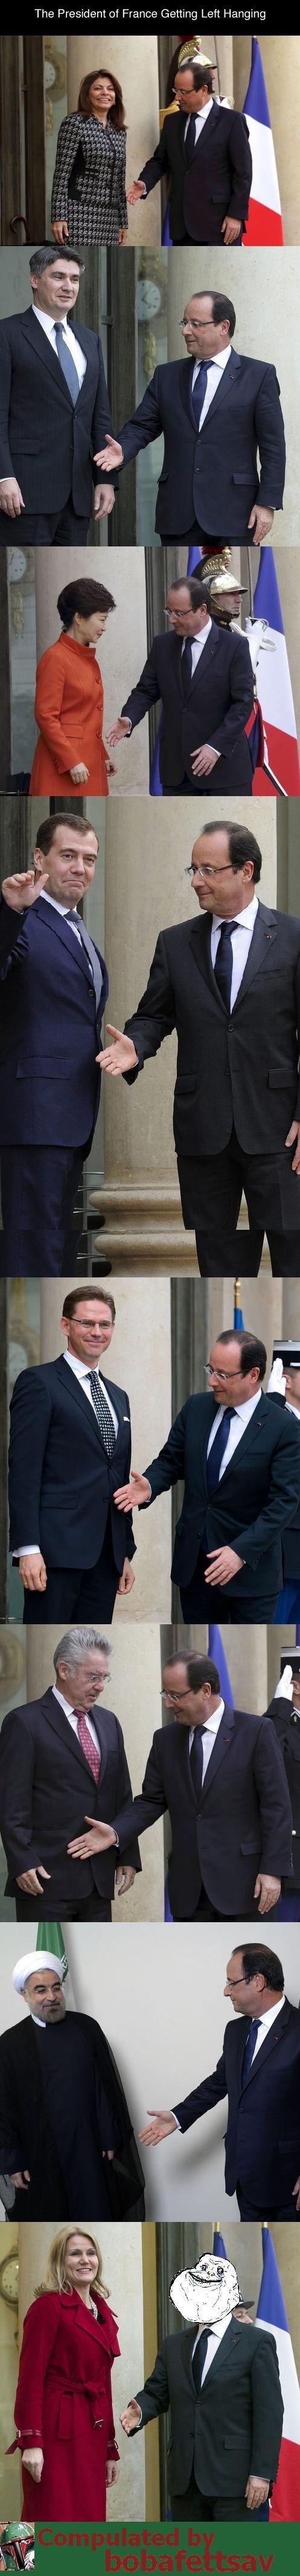 French President, François Hollande. . The President of France Getting Left Hanging French President François Hollande The of France Getting Left Hanging